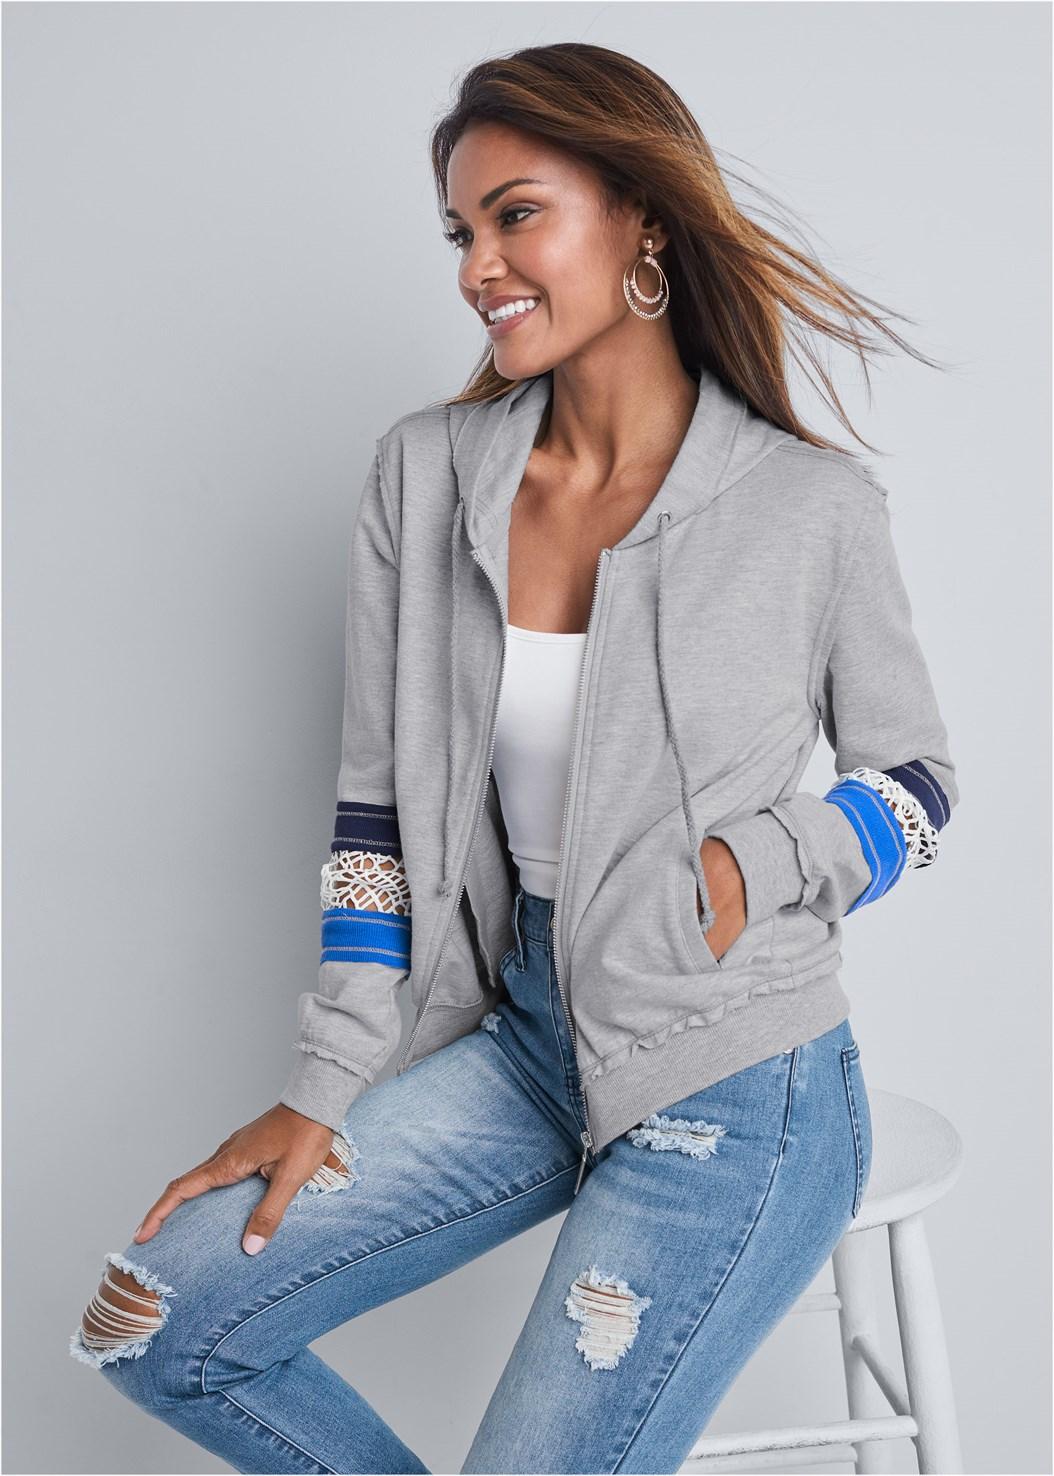 Crochet Trim Lounge Jacket,Basic Cami Two Pack,Triangle Hem Jeans,Rhinestone Thong Sandal